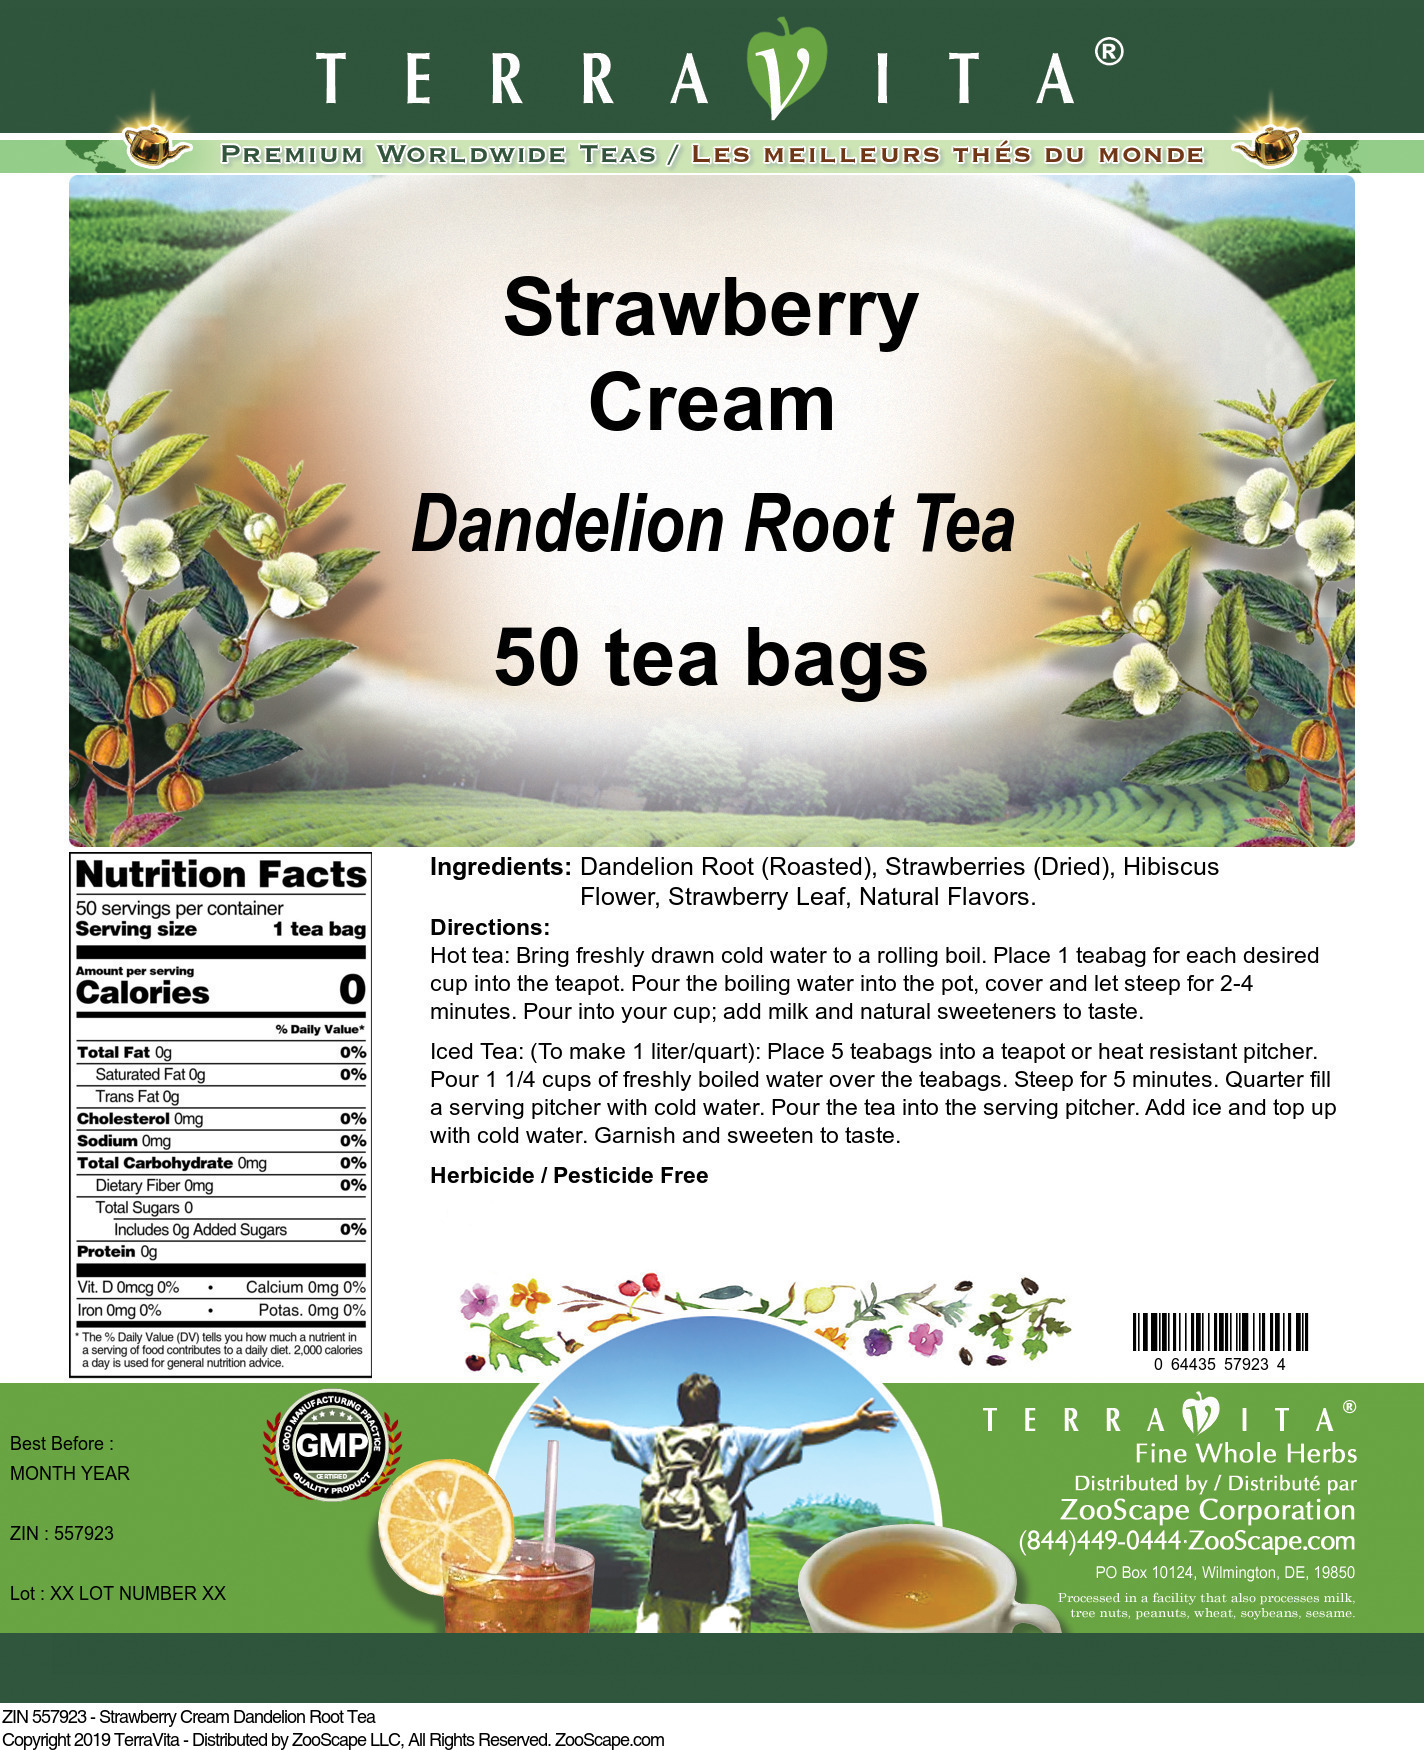 Strawberry Cream Dandelion Root